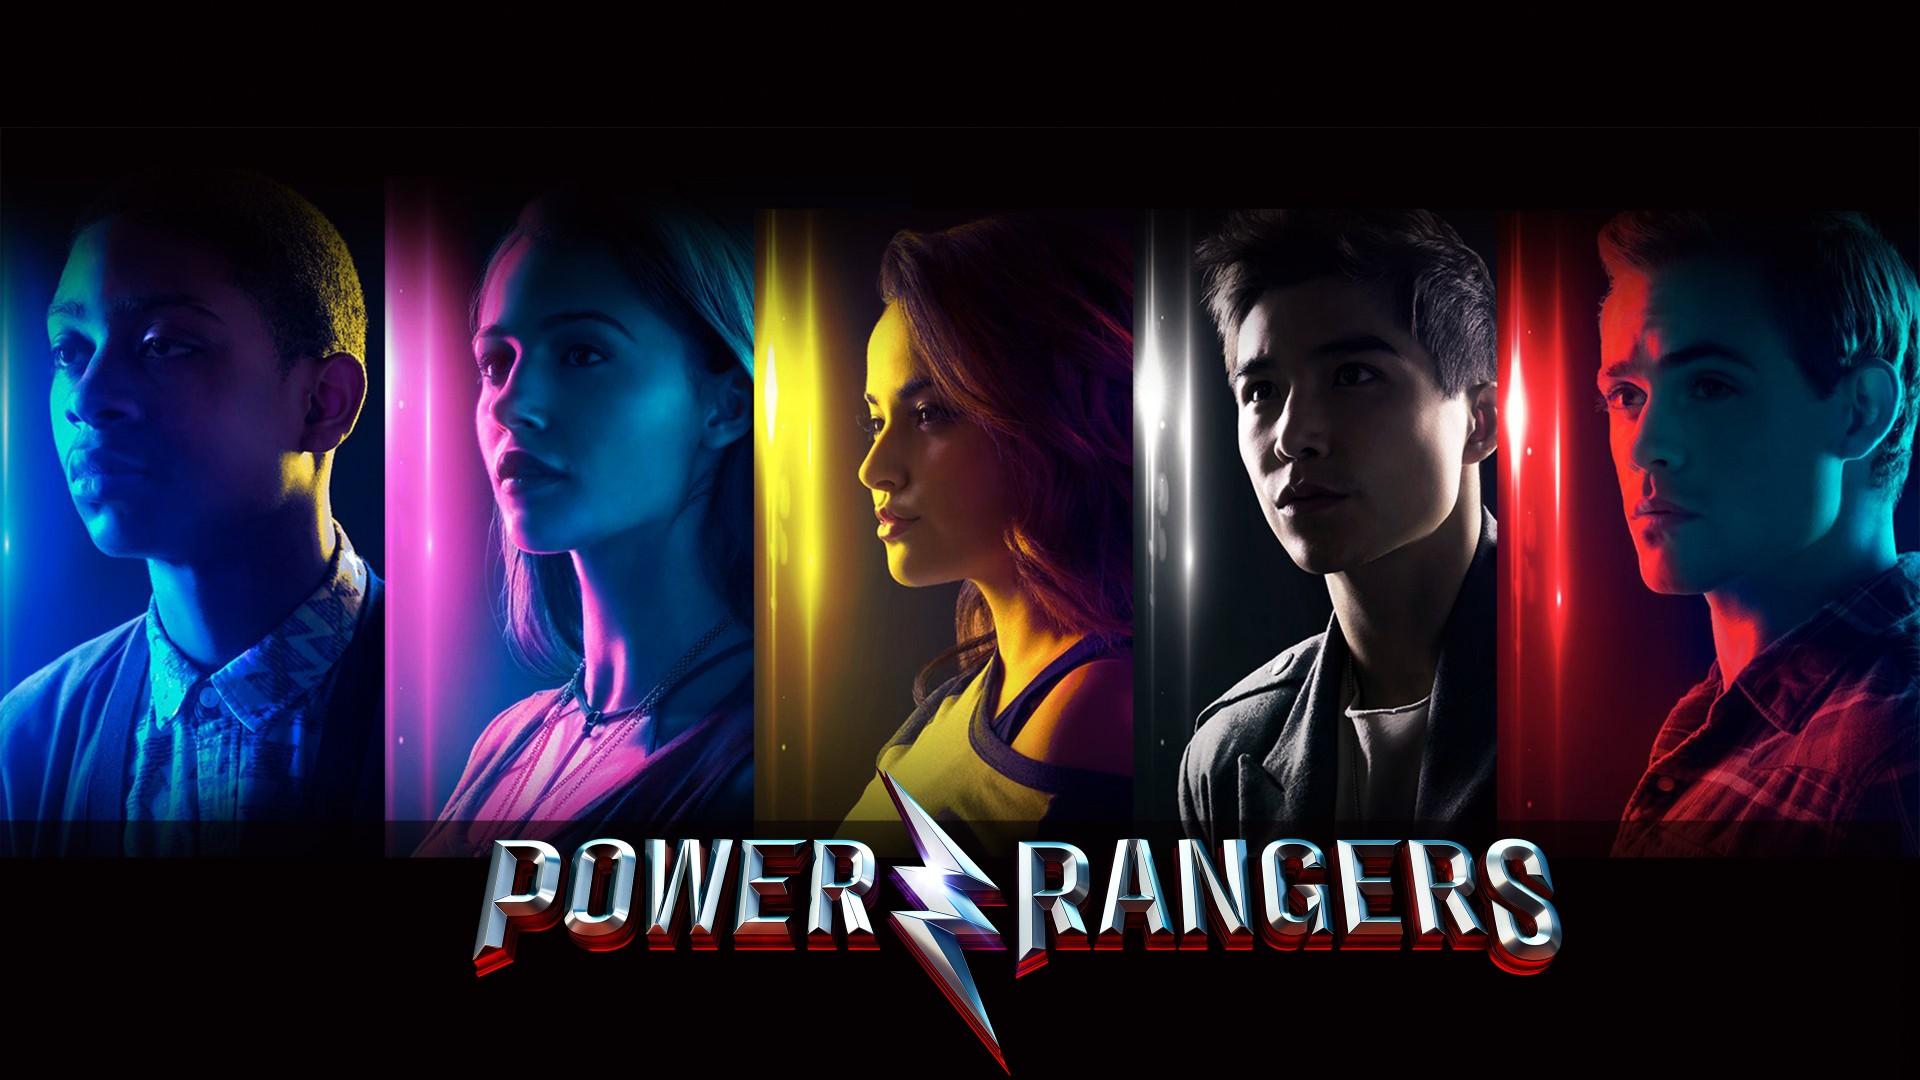 Wallpaper Hd Iphone Cute Men Power Rangers Movie 4k 2017 Wallpapers Hd Wallpapers